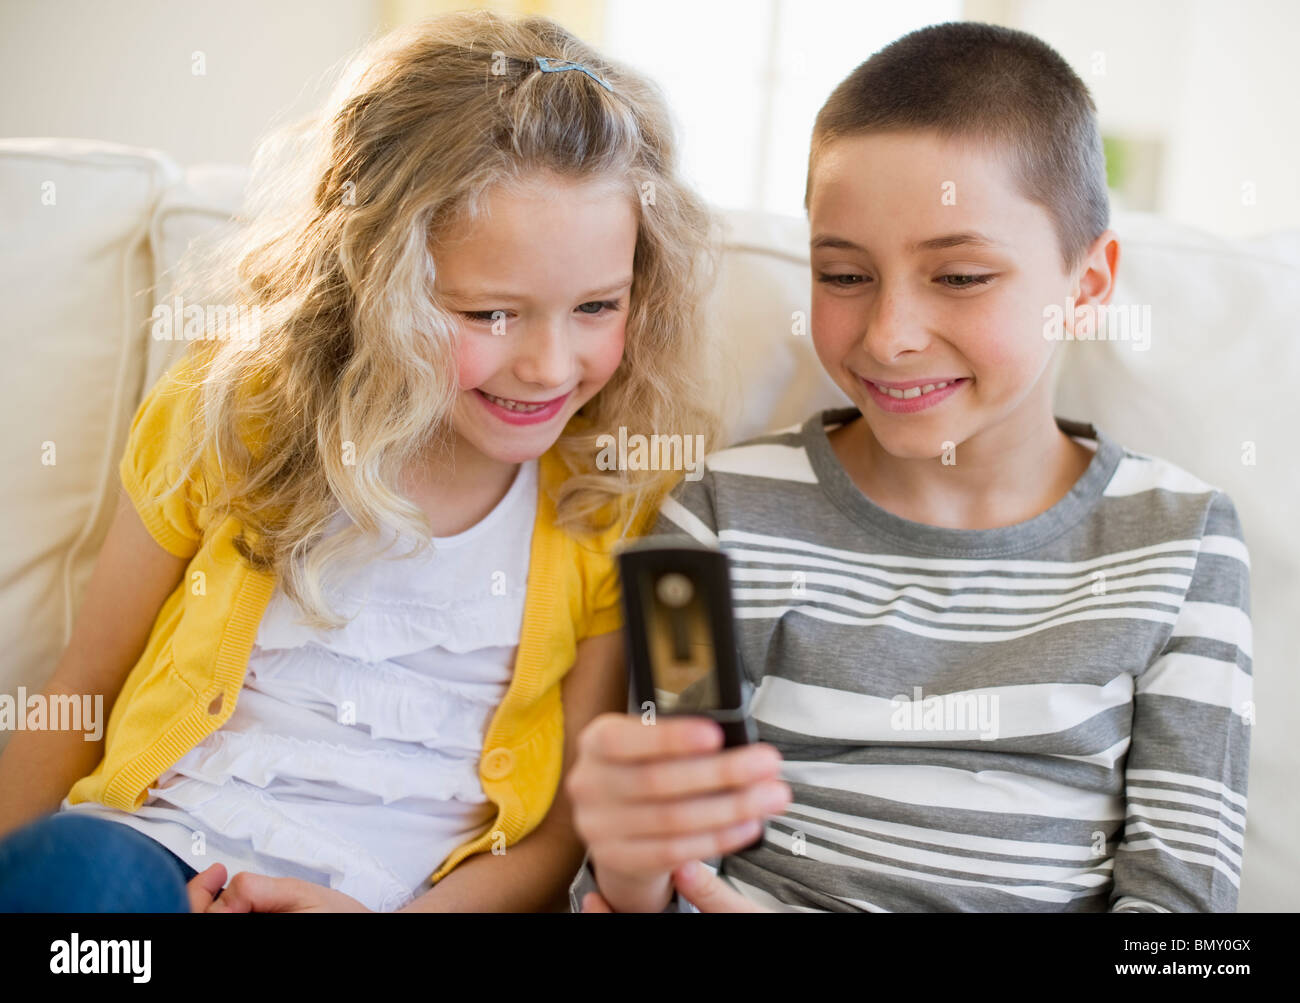 Siblings looking at cellular phone - Stock Image